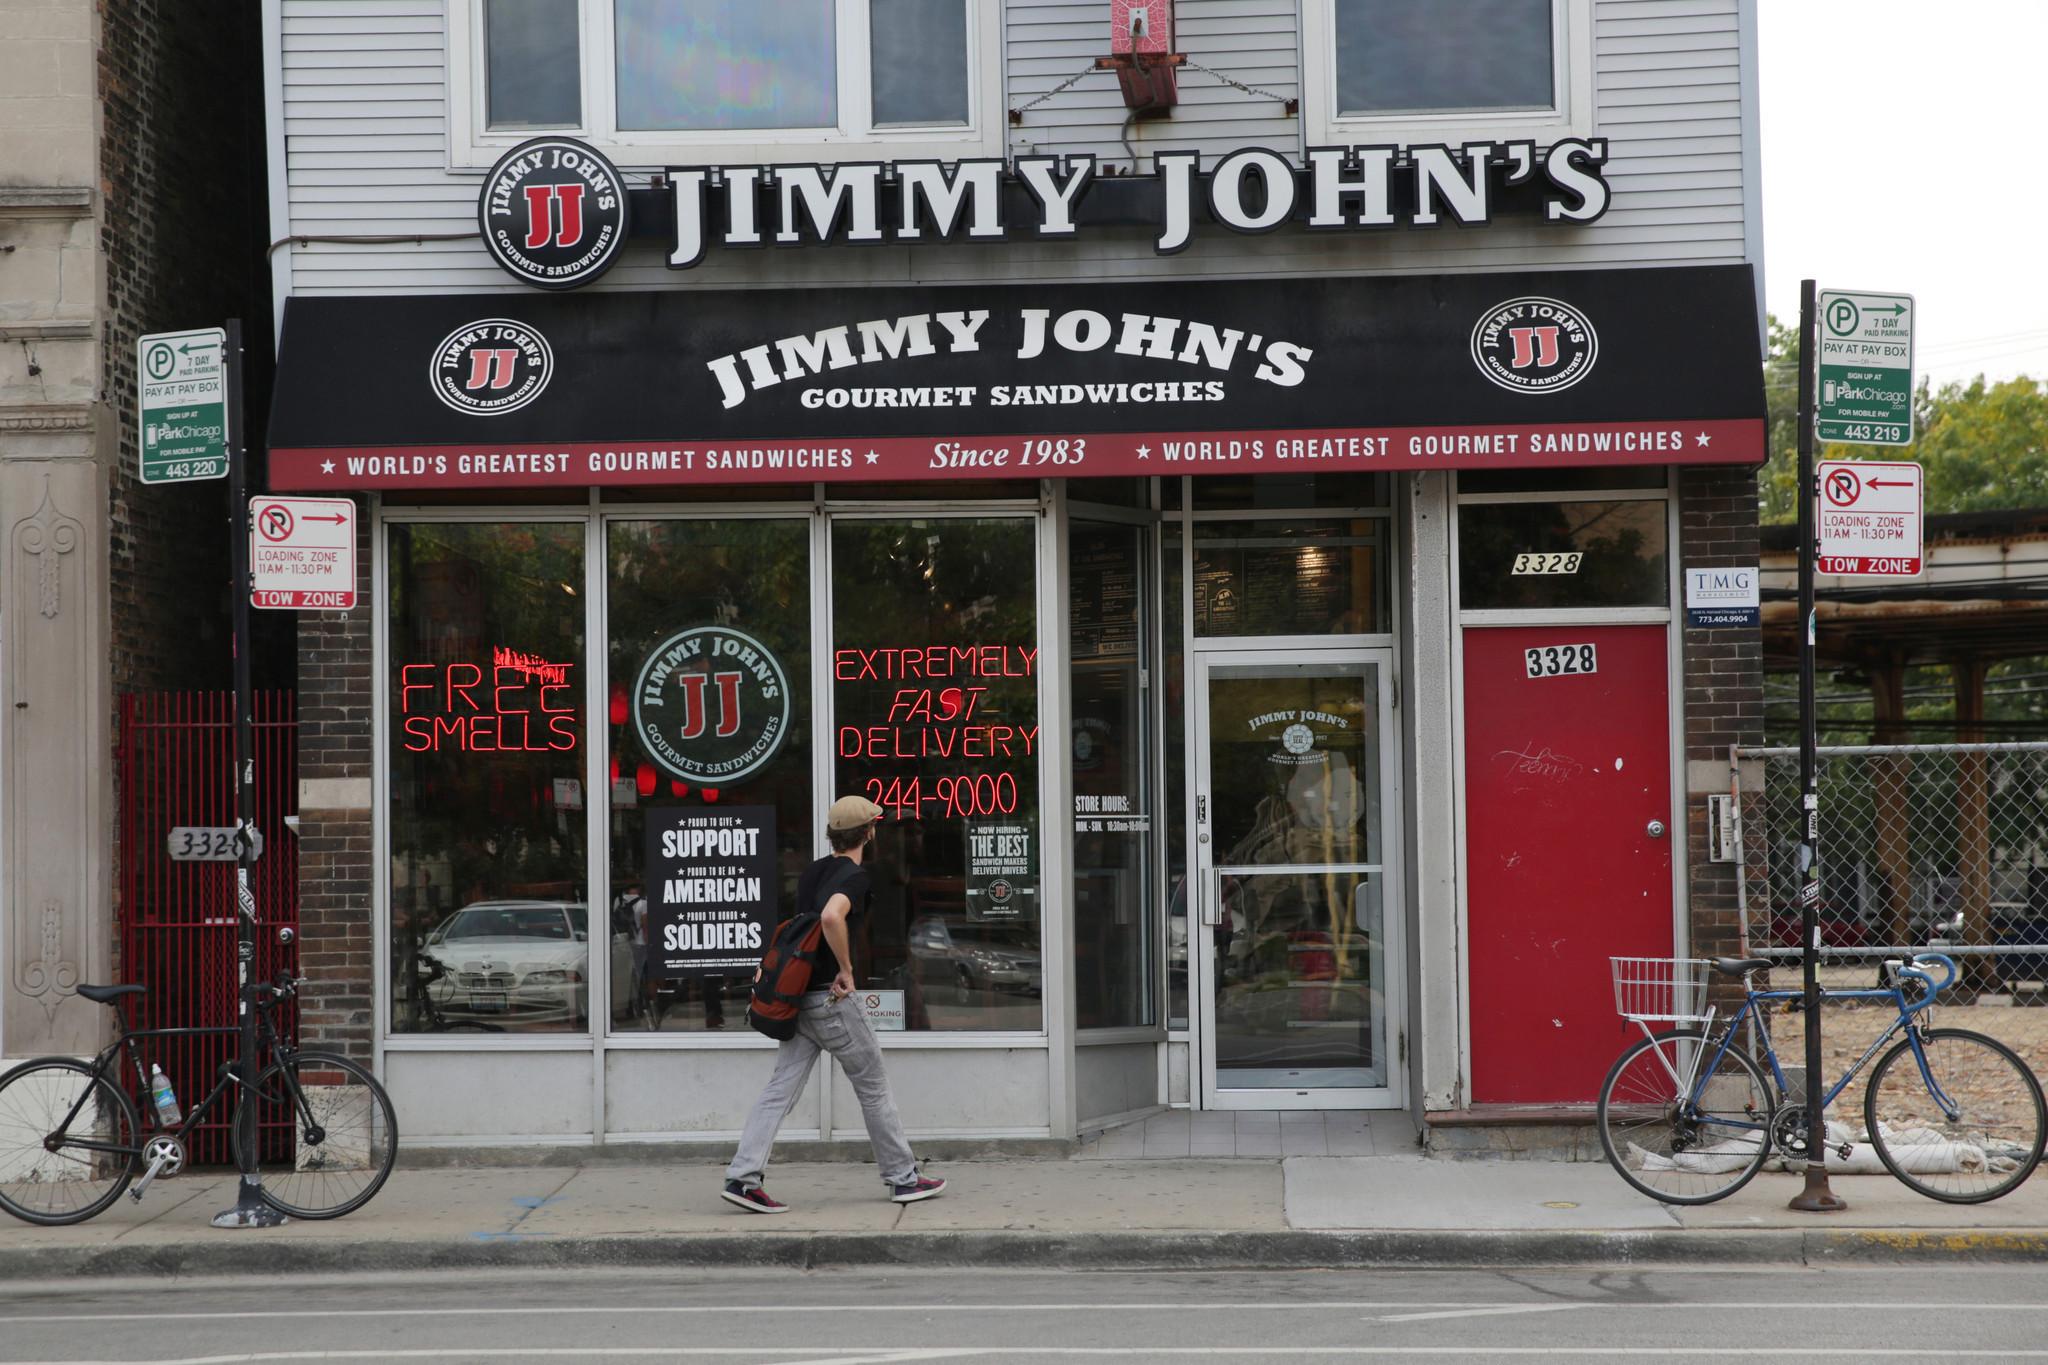 Report: Jimmy Johns preparing IPO - Chicago Tribune